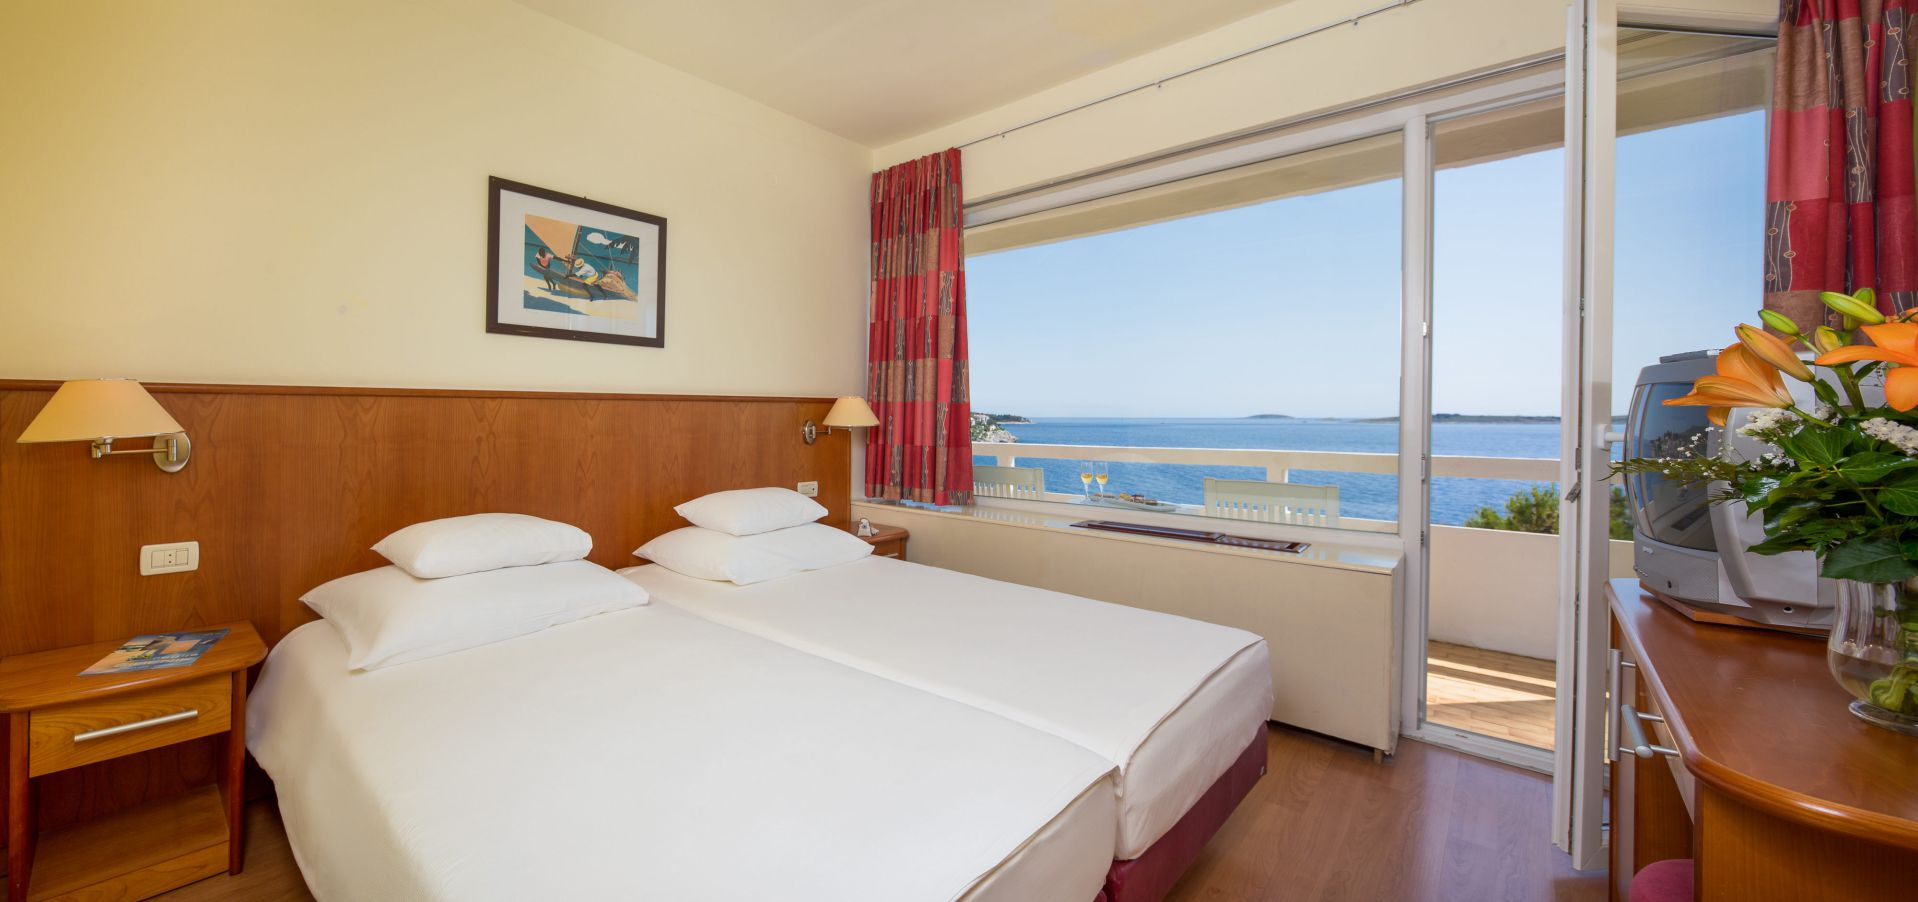 comfort family room 01 14638702460 o - Zora Hotel